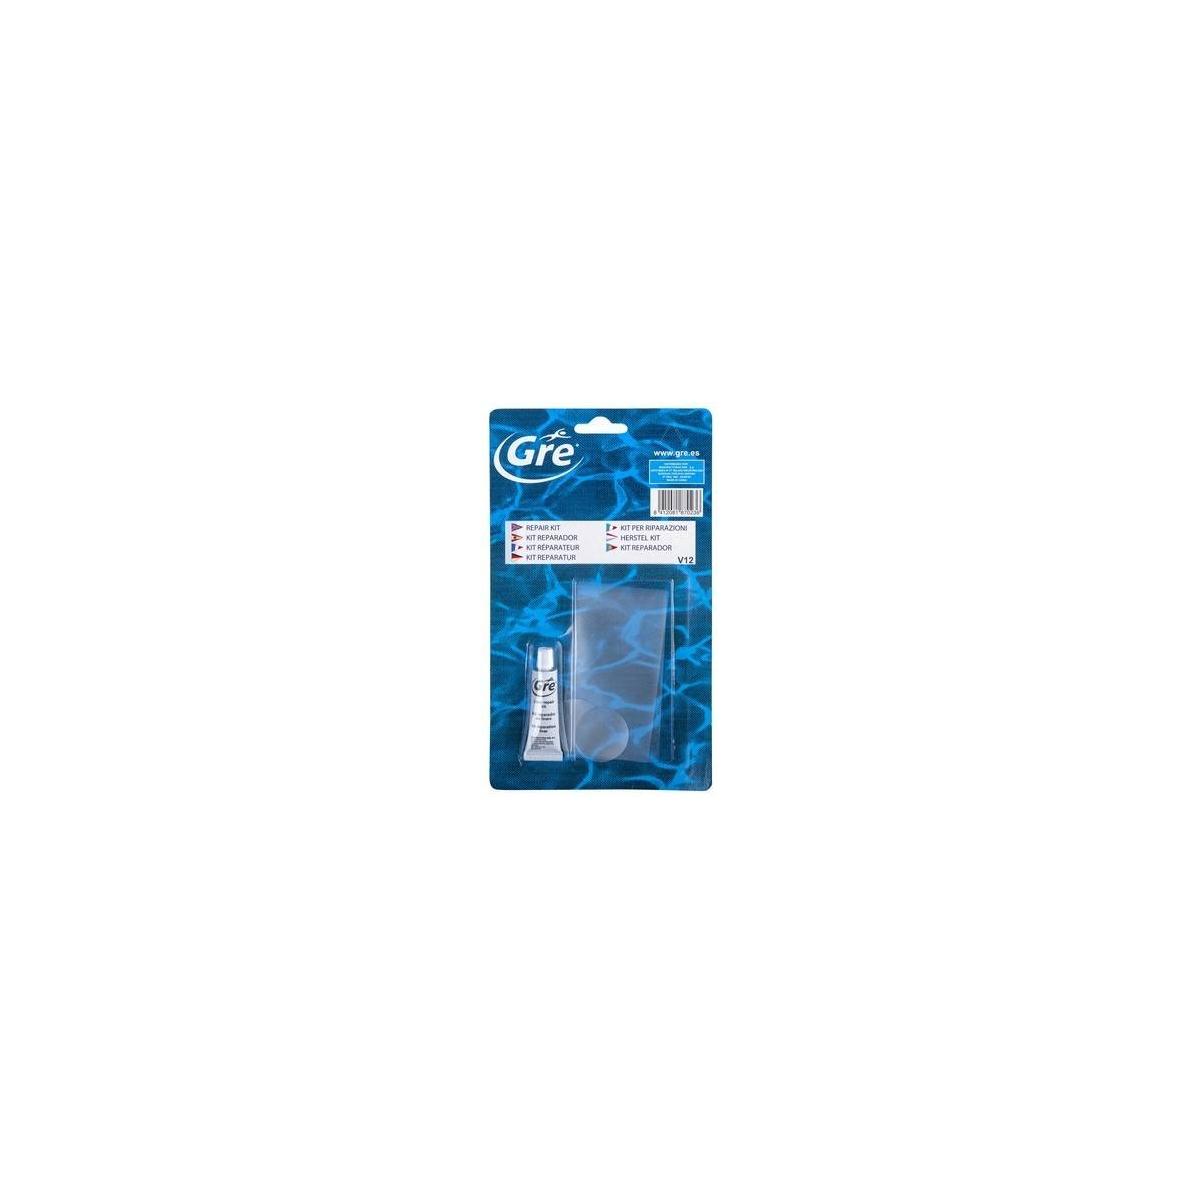 Kit reparador PVC (incluye parches)